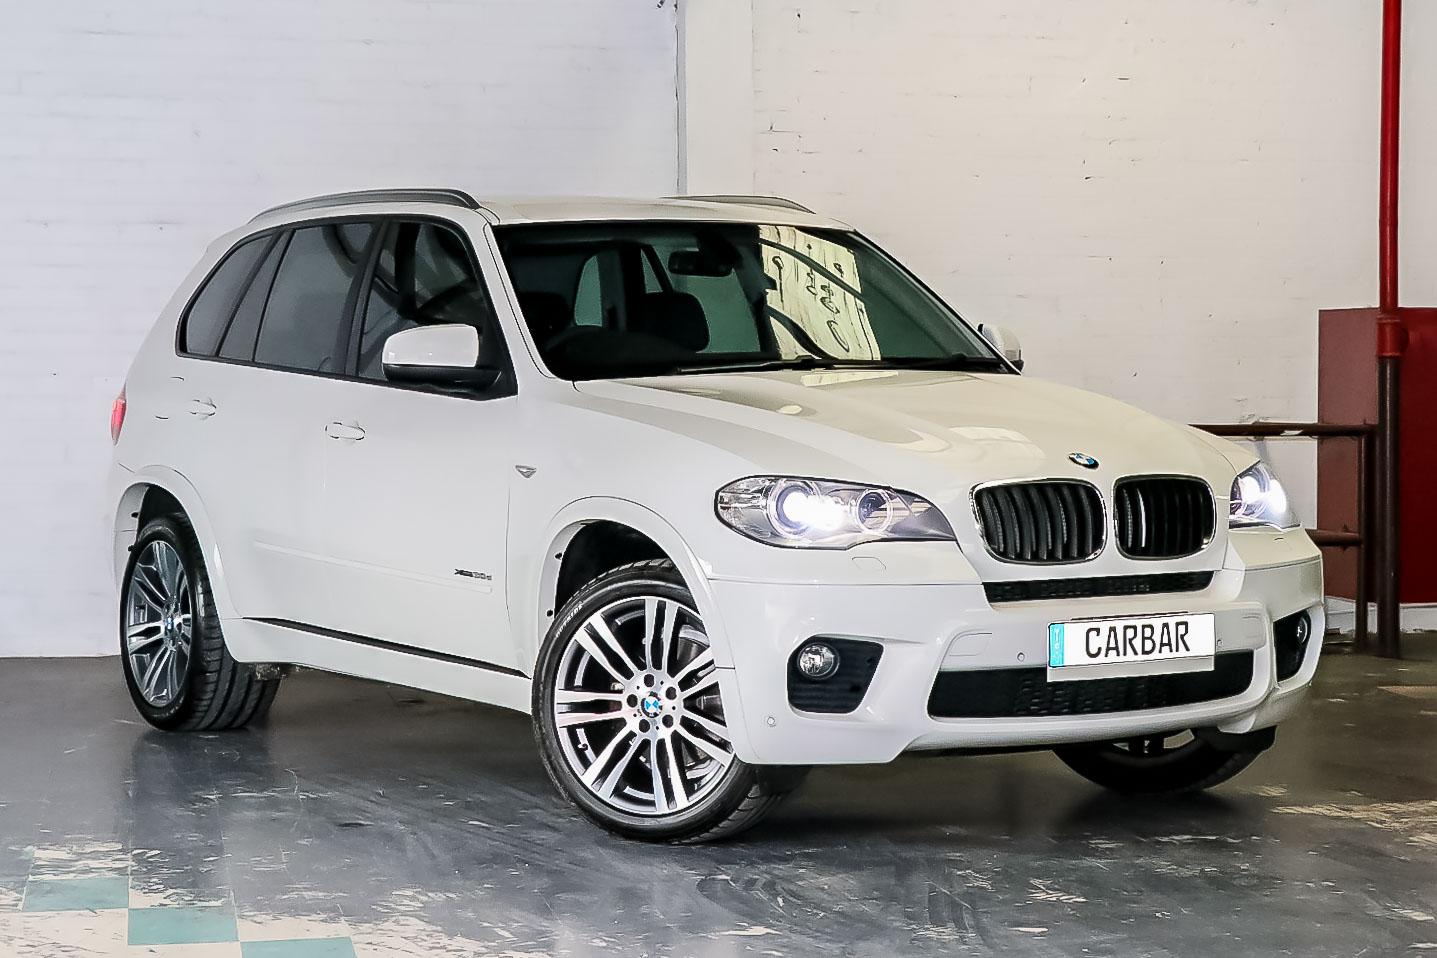 Carbar-2013-BMW-X5-293920180810-121143.jpg